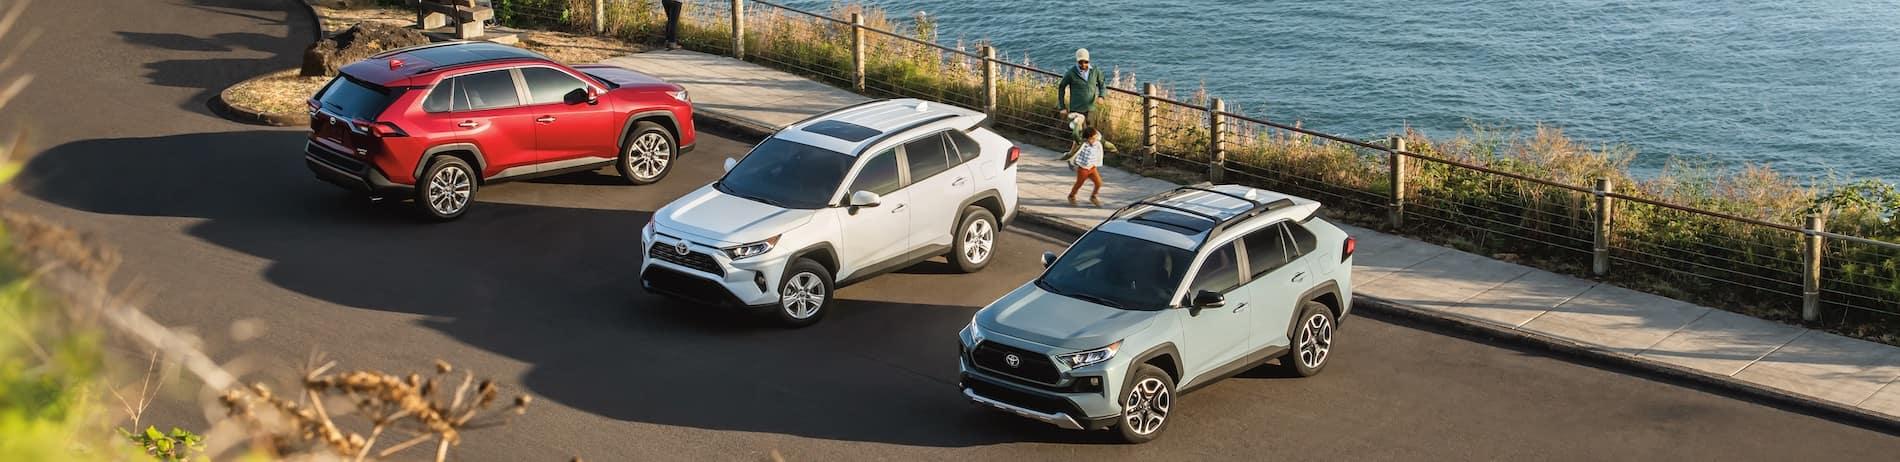 Toyota RAV4 Vehicle Line Up